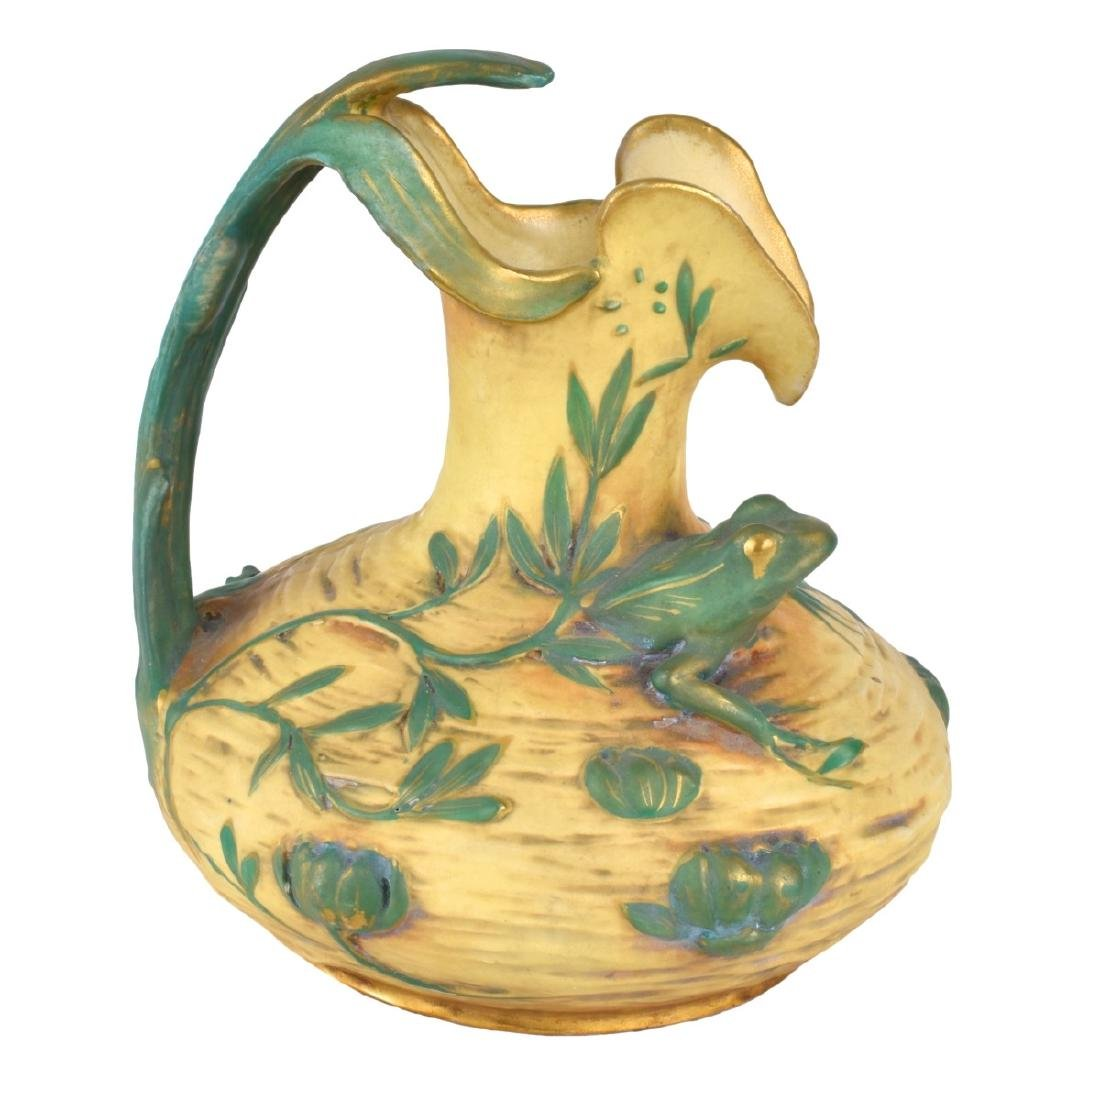 Amphora Art Nouveau Polychrome Pottery Vase